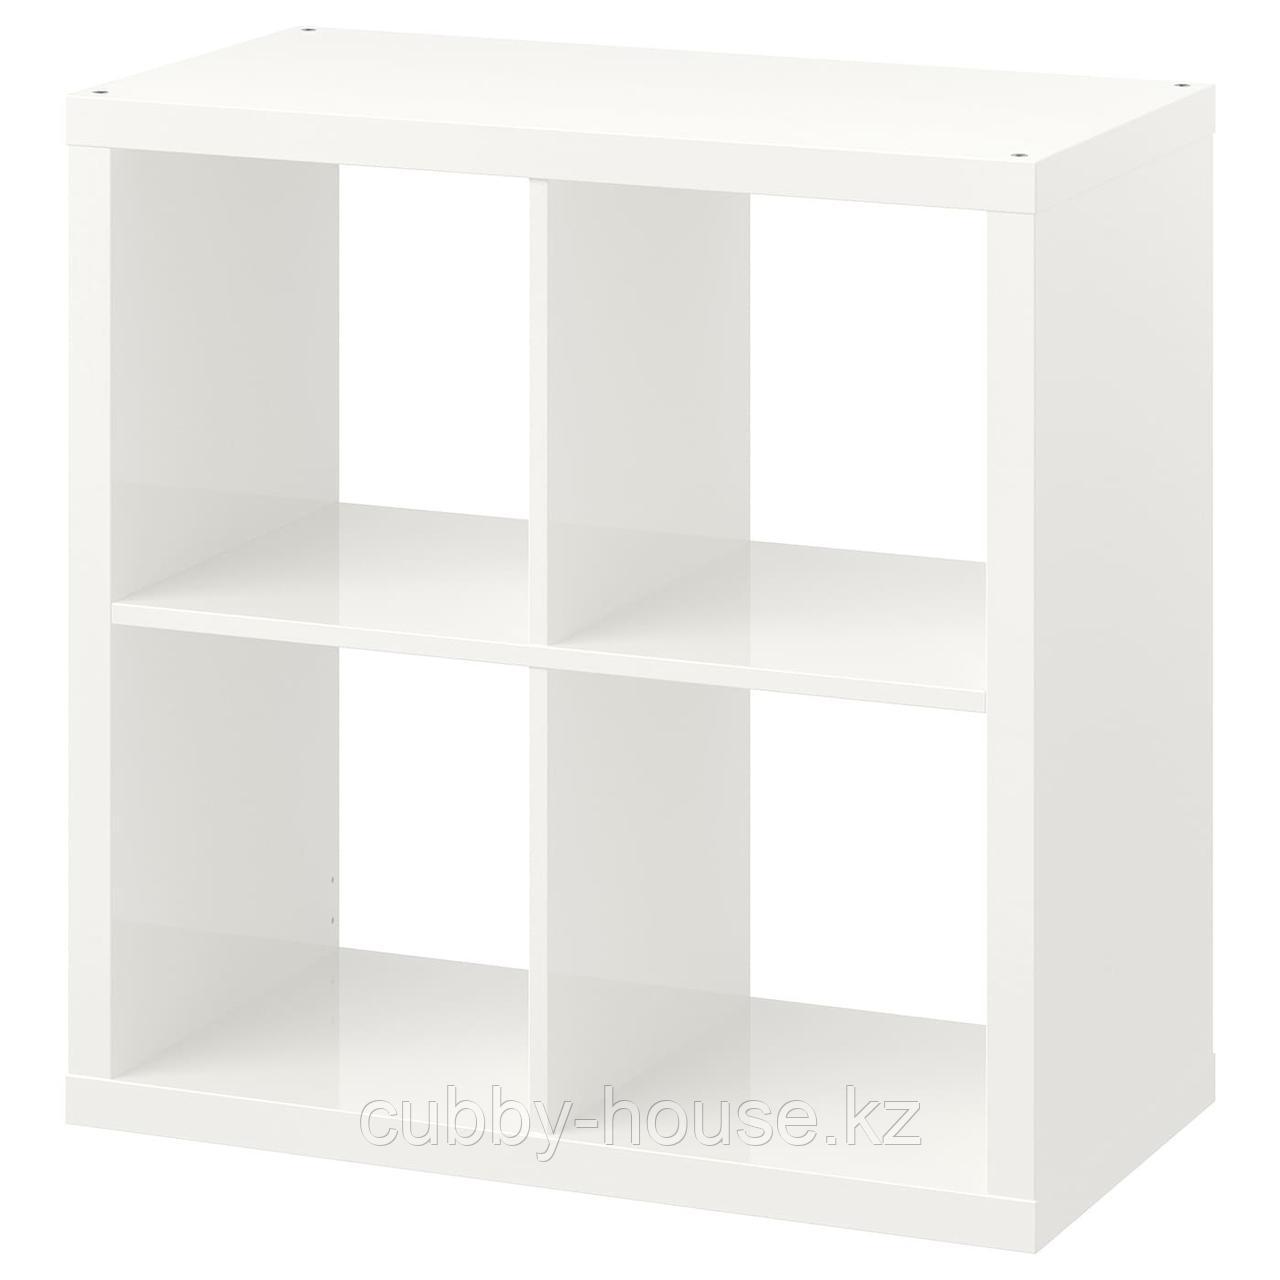 КАЛЛАКС Стеллаж, белый, 77x77 см